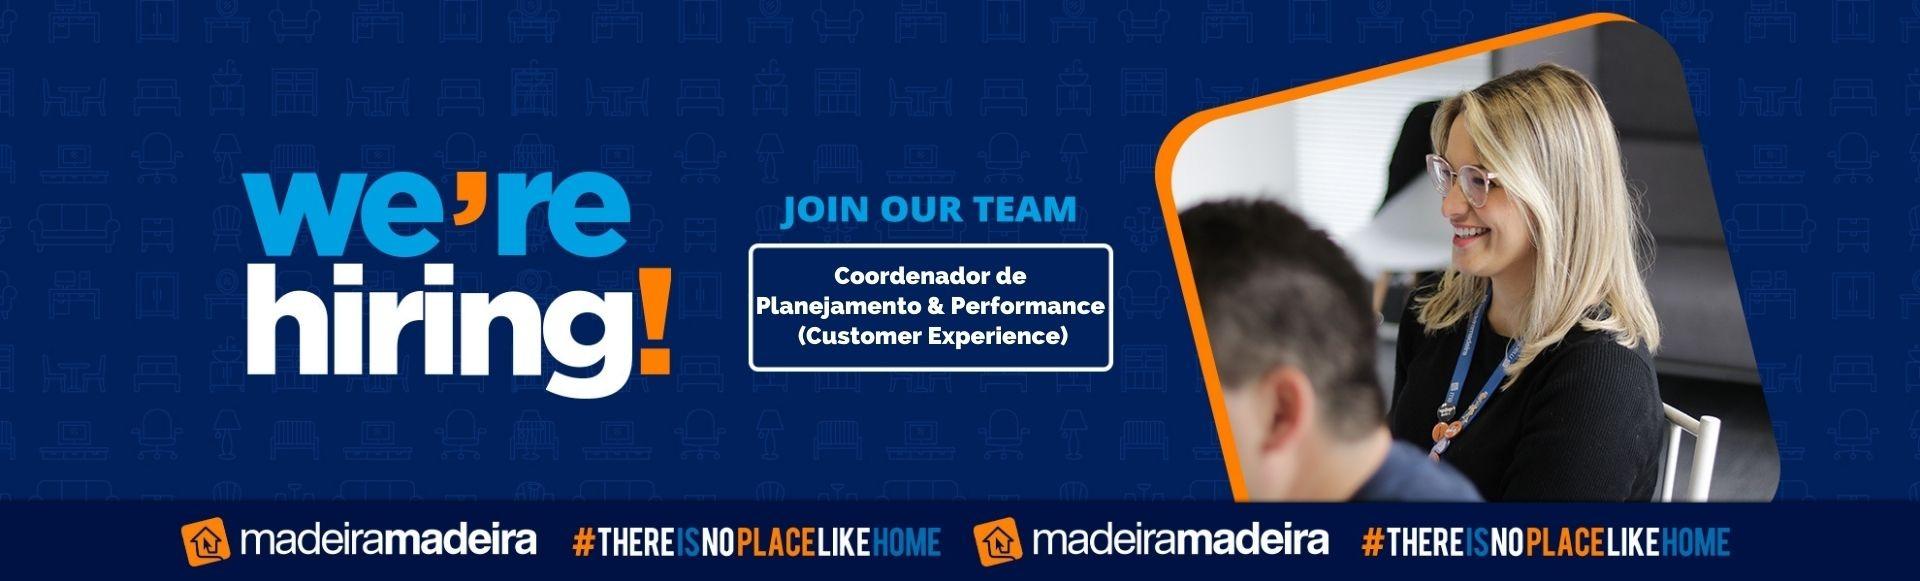 Coordenador de Planejamento & Performance (Customer Experience)